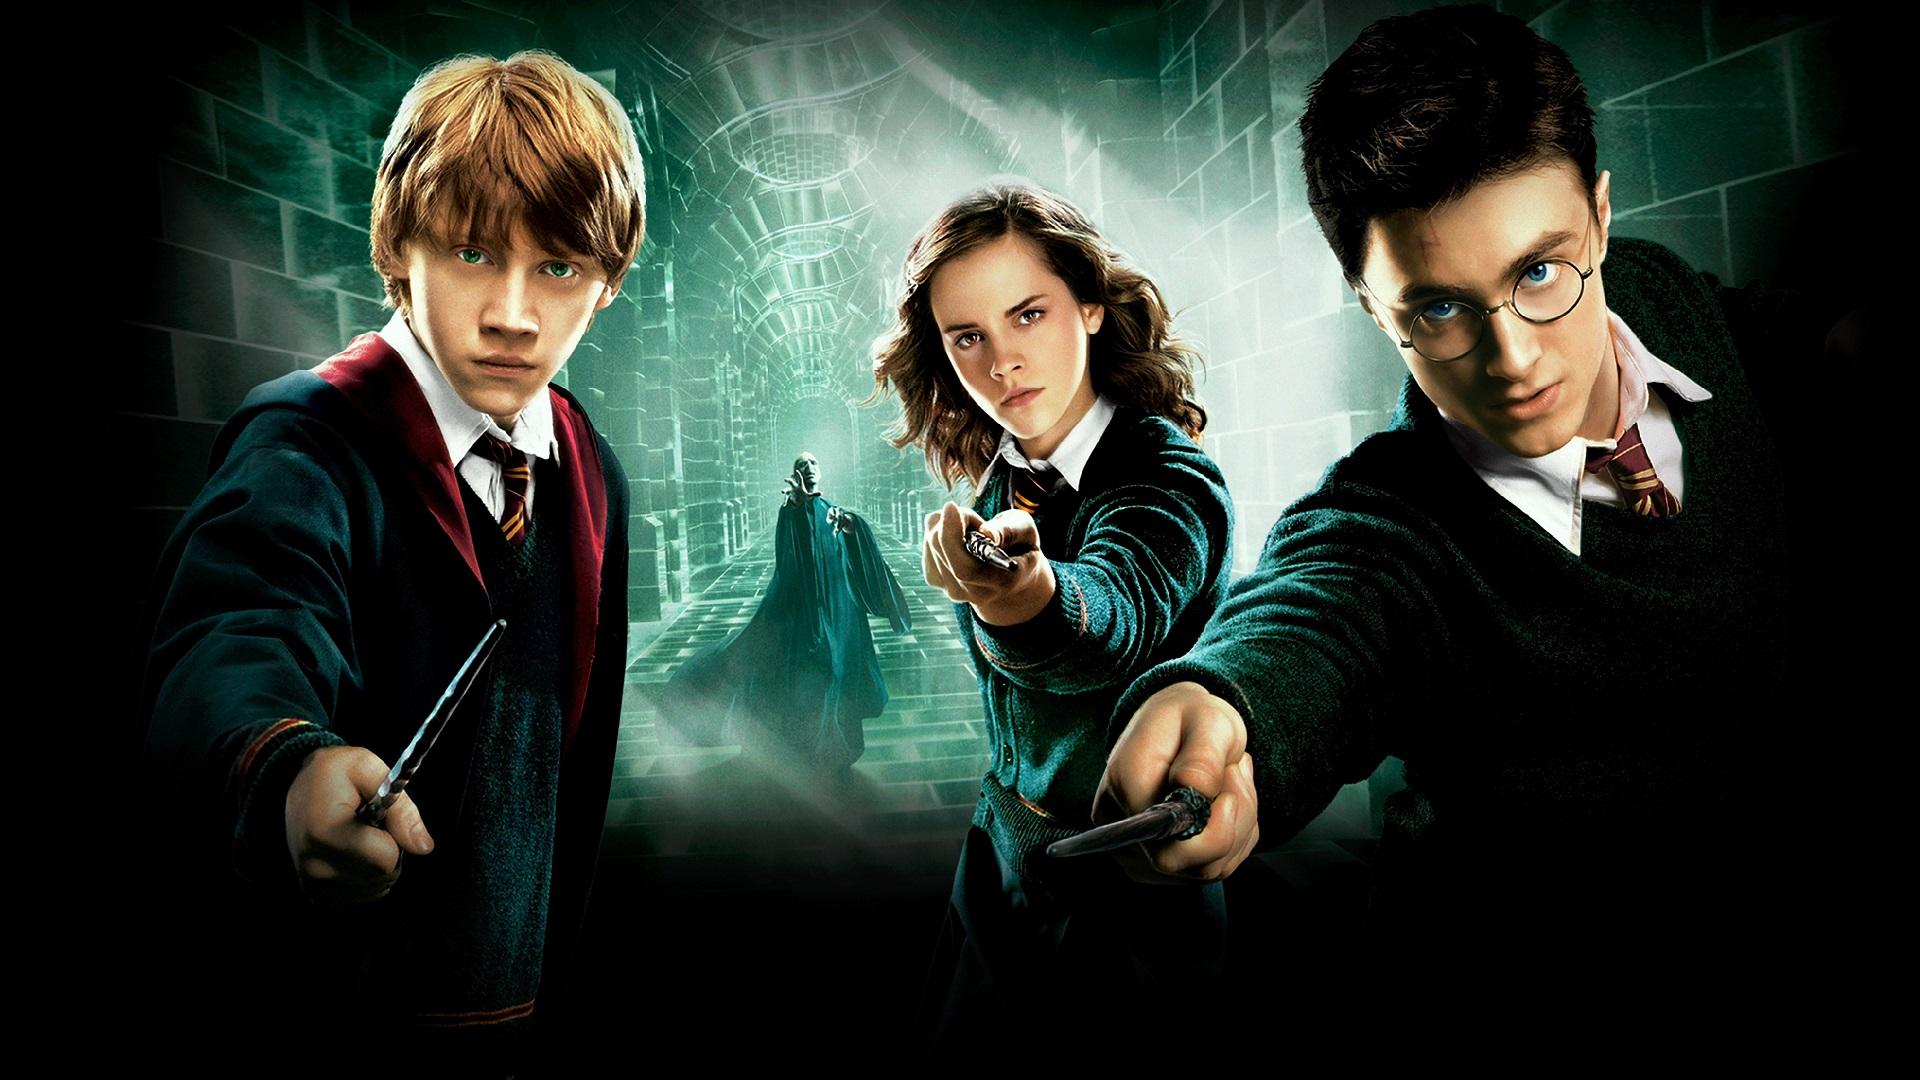 Harry Potter 5 Stream Hd